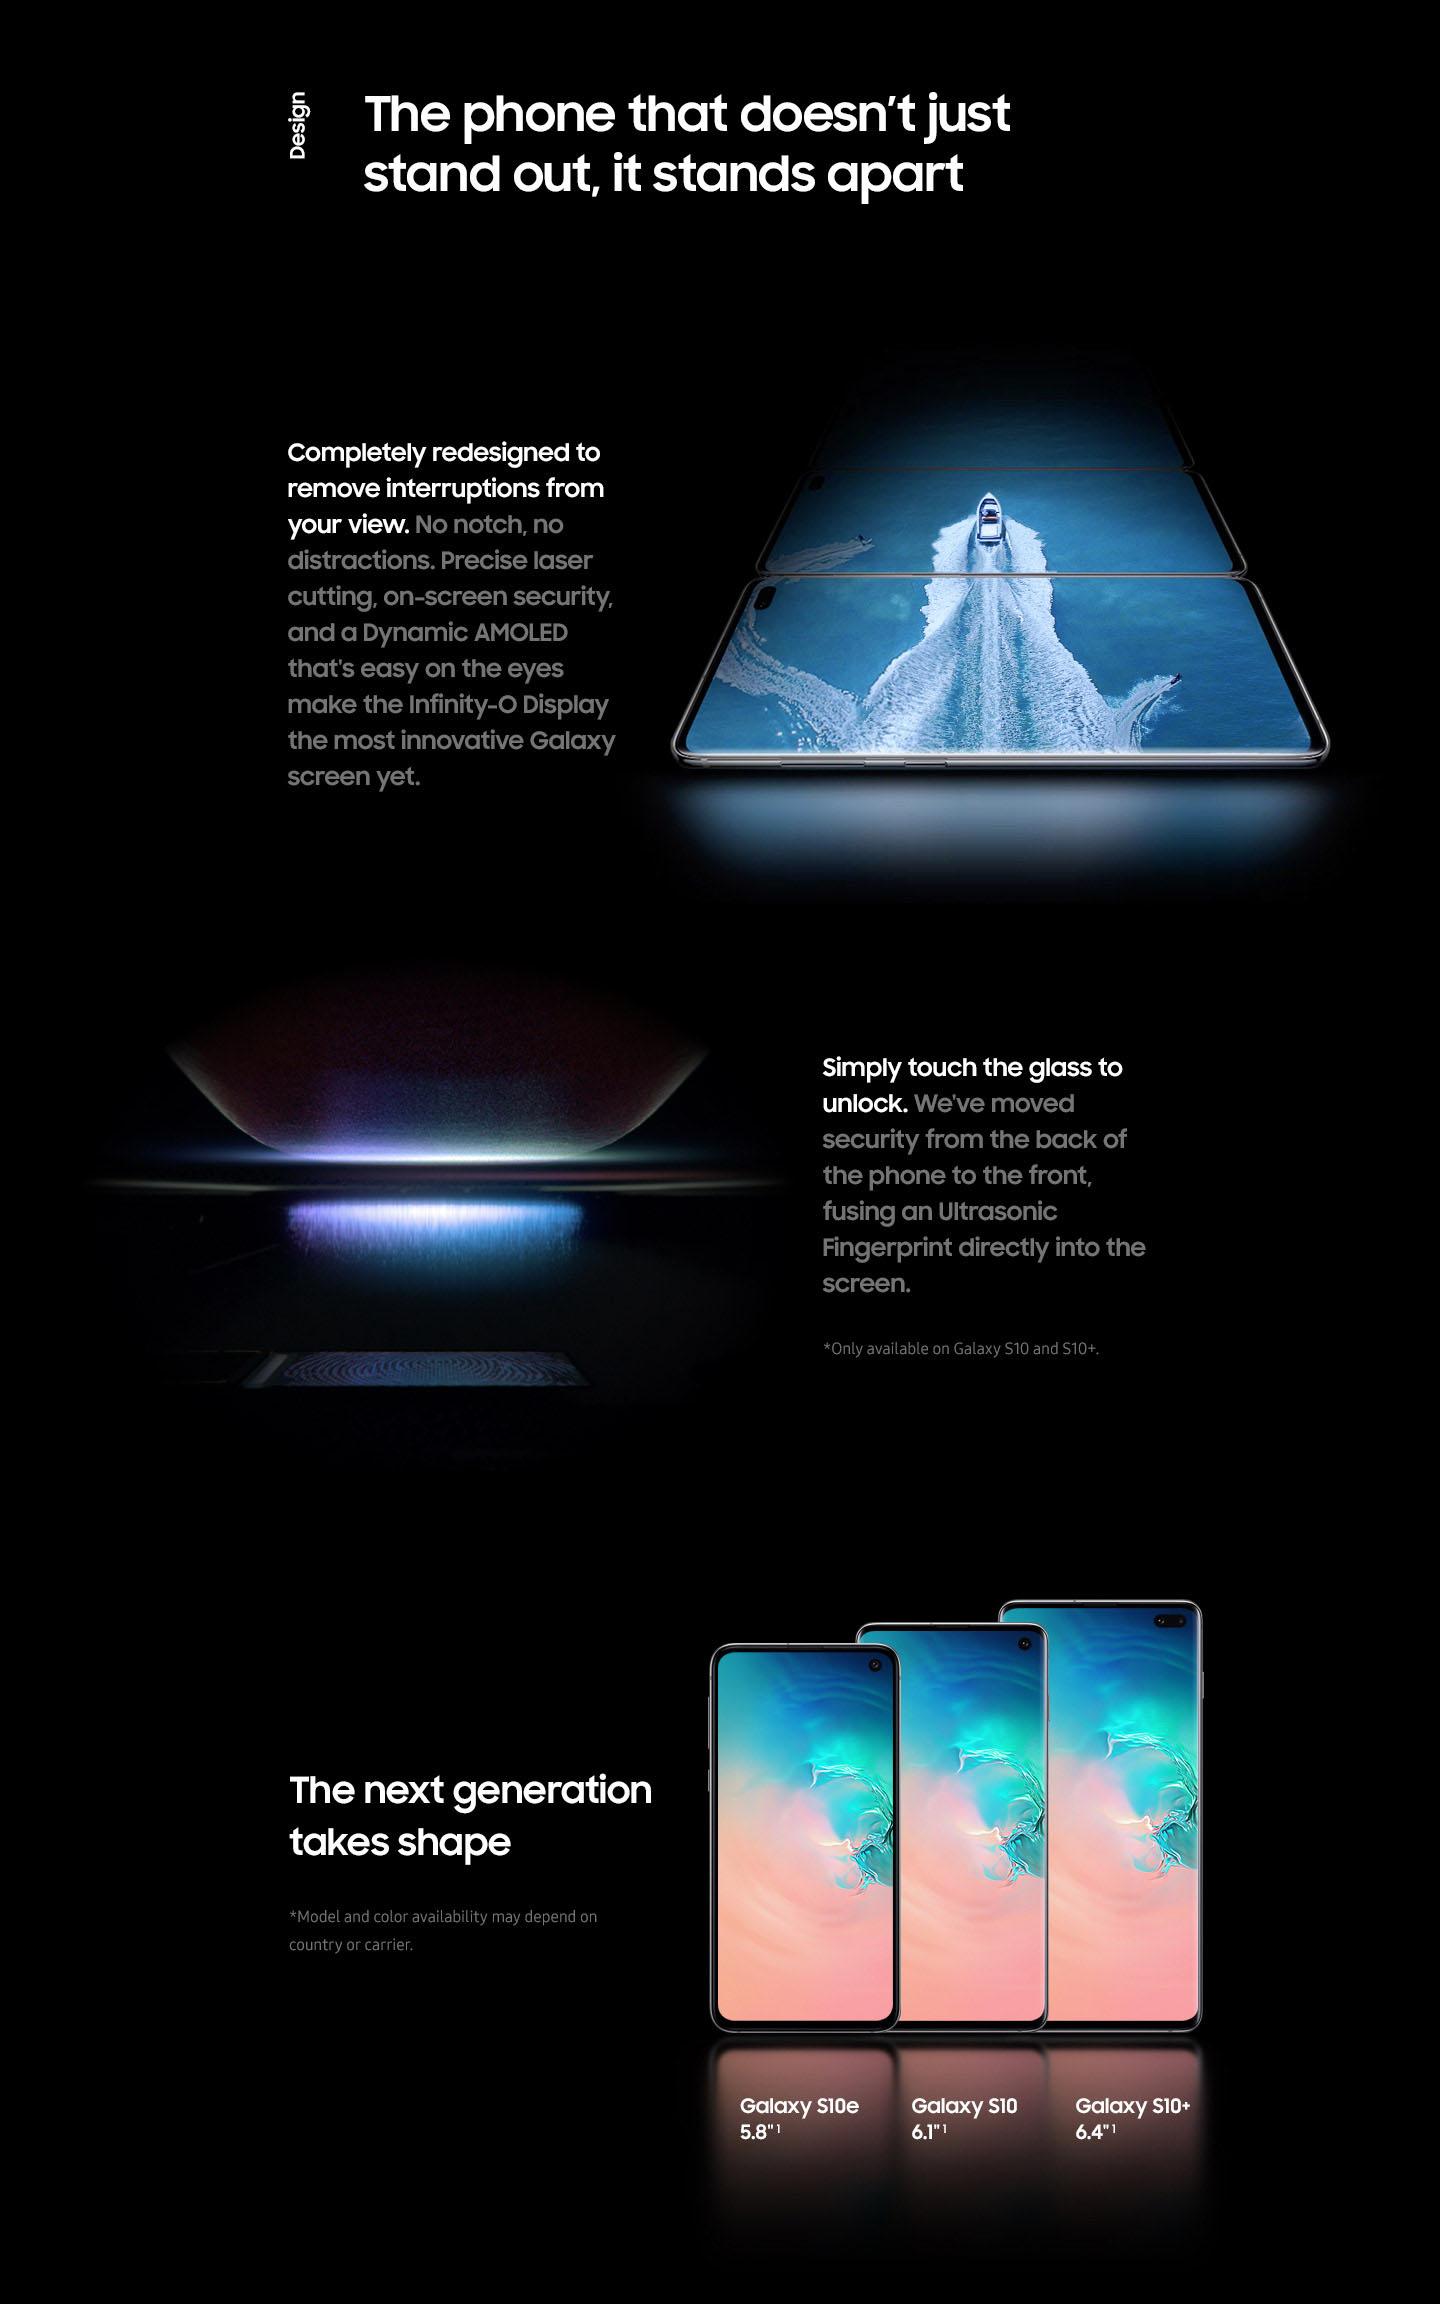 Samsung Beyond 2019